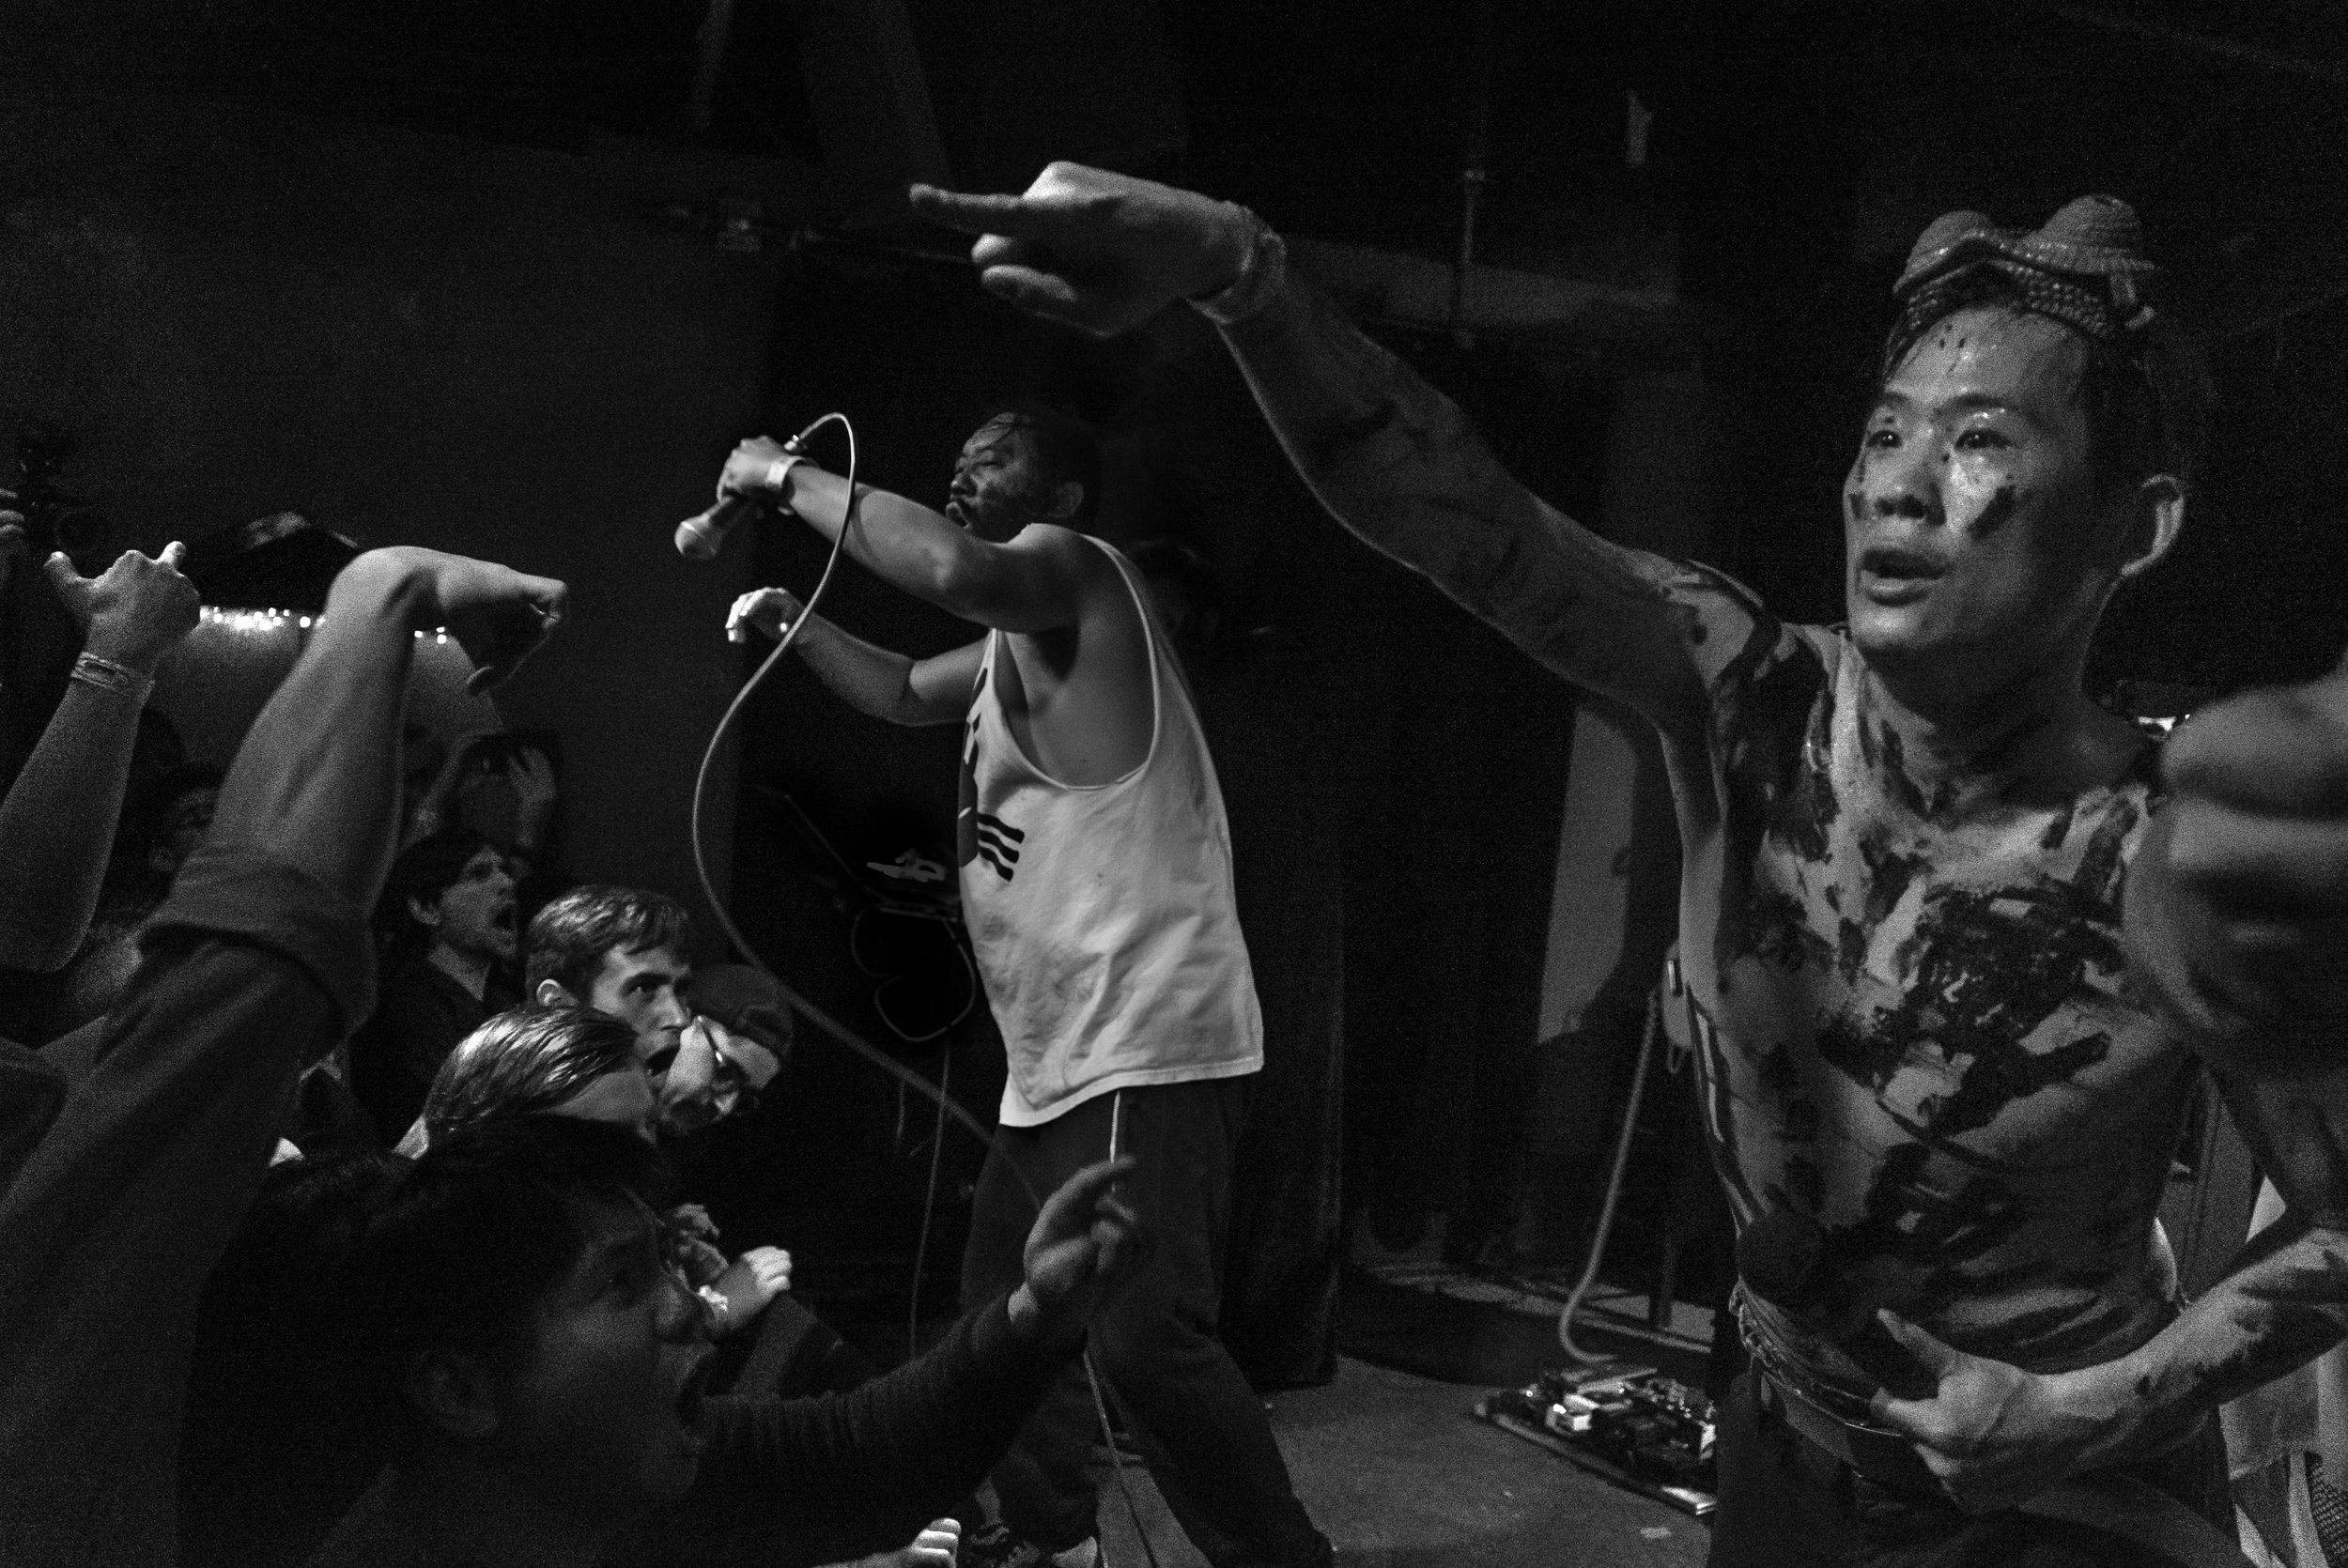 david-choe-mangchi-under-the-cobbletones-lulu-east-coast-tour-2016-tour-live-music-12.jpg